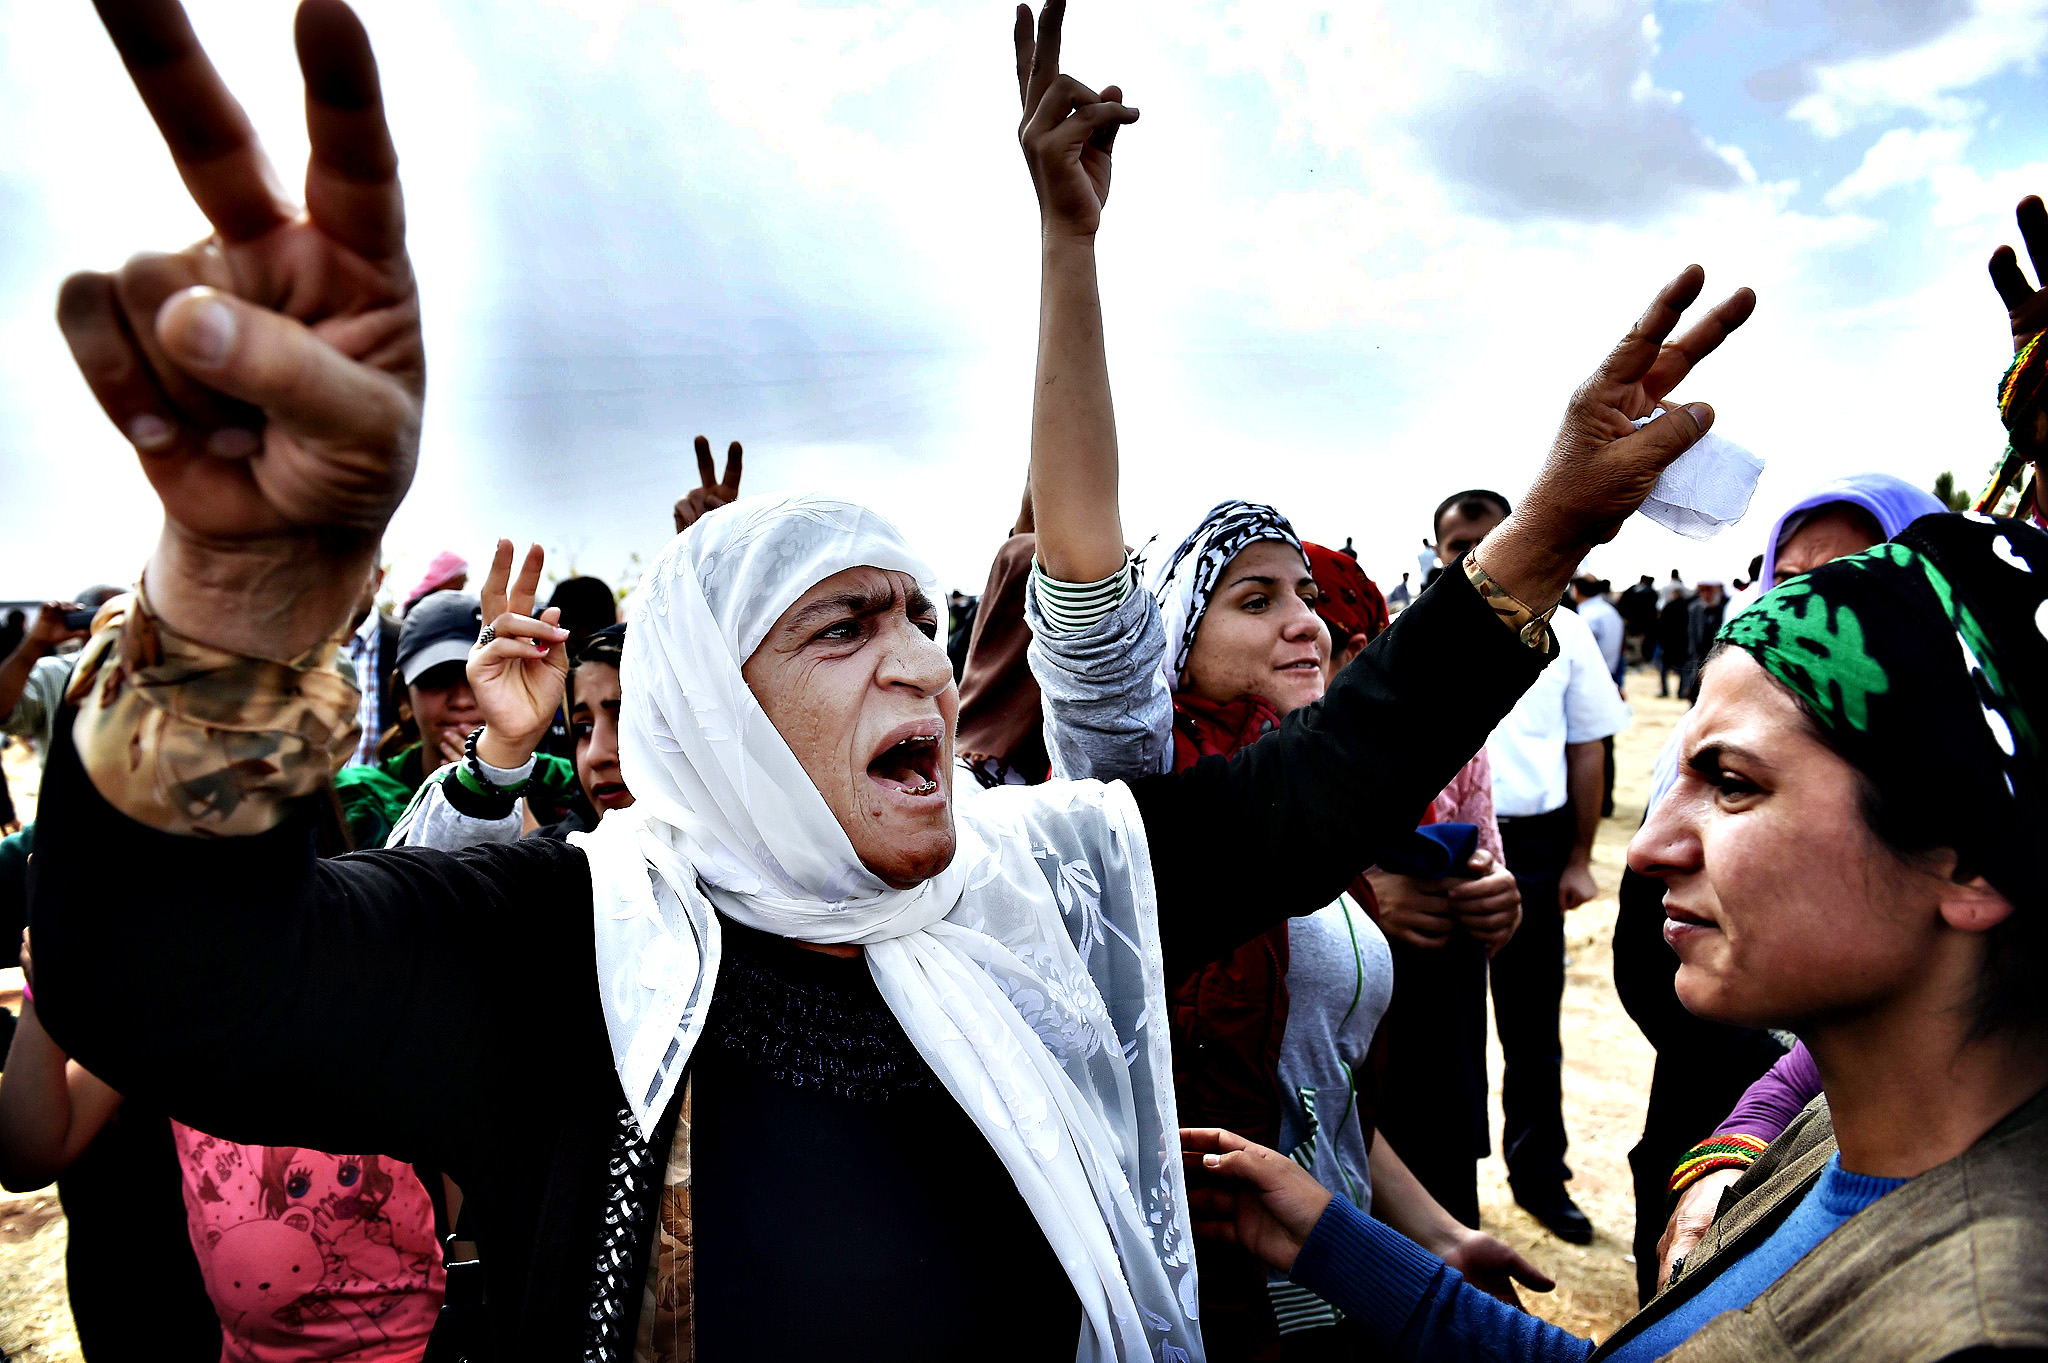 Uk muslims press for peace at 10 downing street - Kurdish Women Shout Slogans During The F Kurdish Women Shout Slogans During The